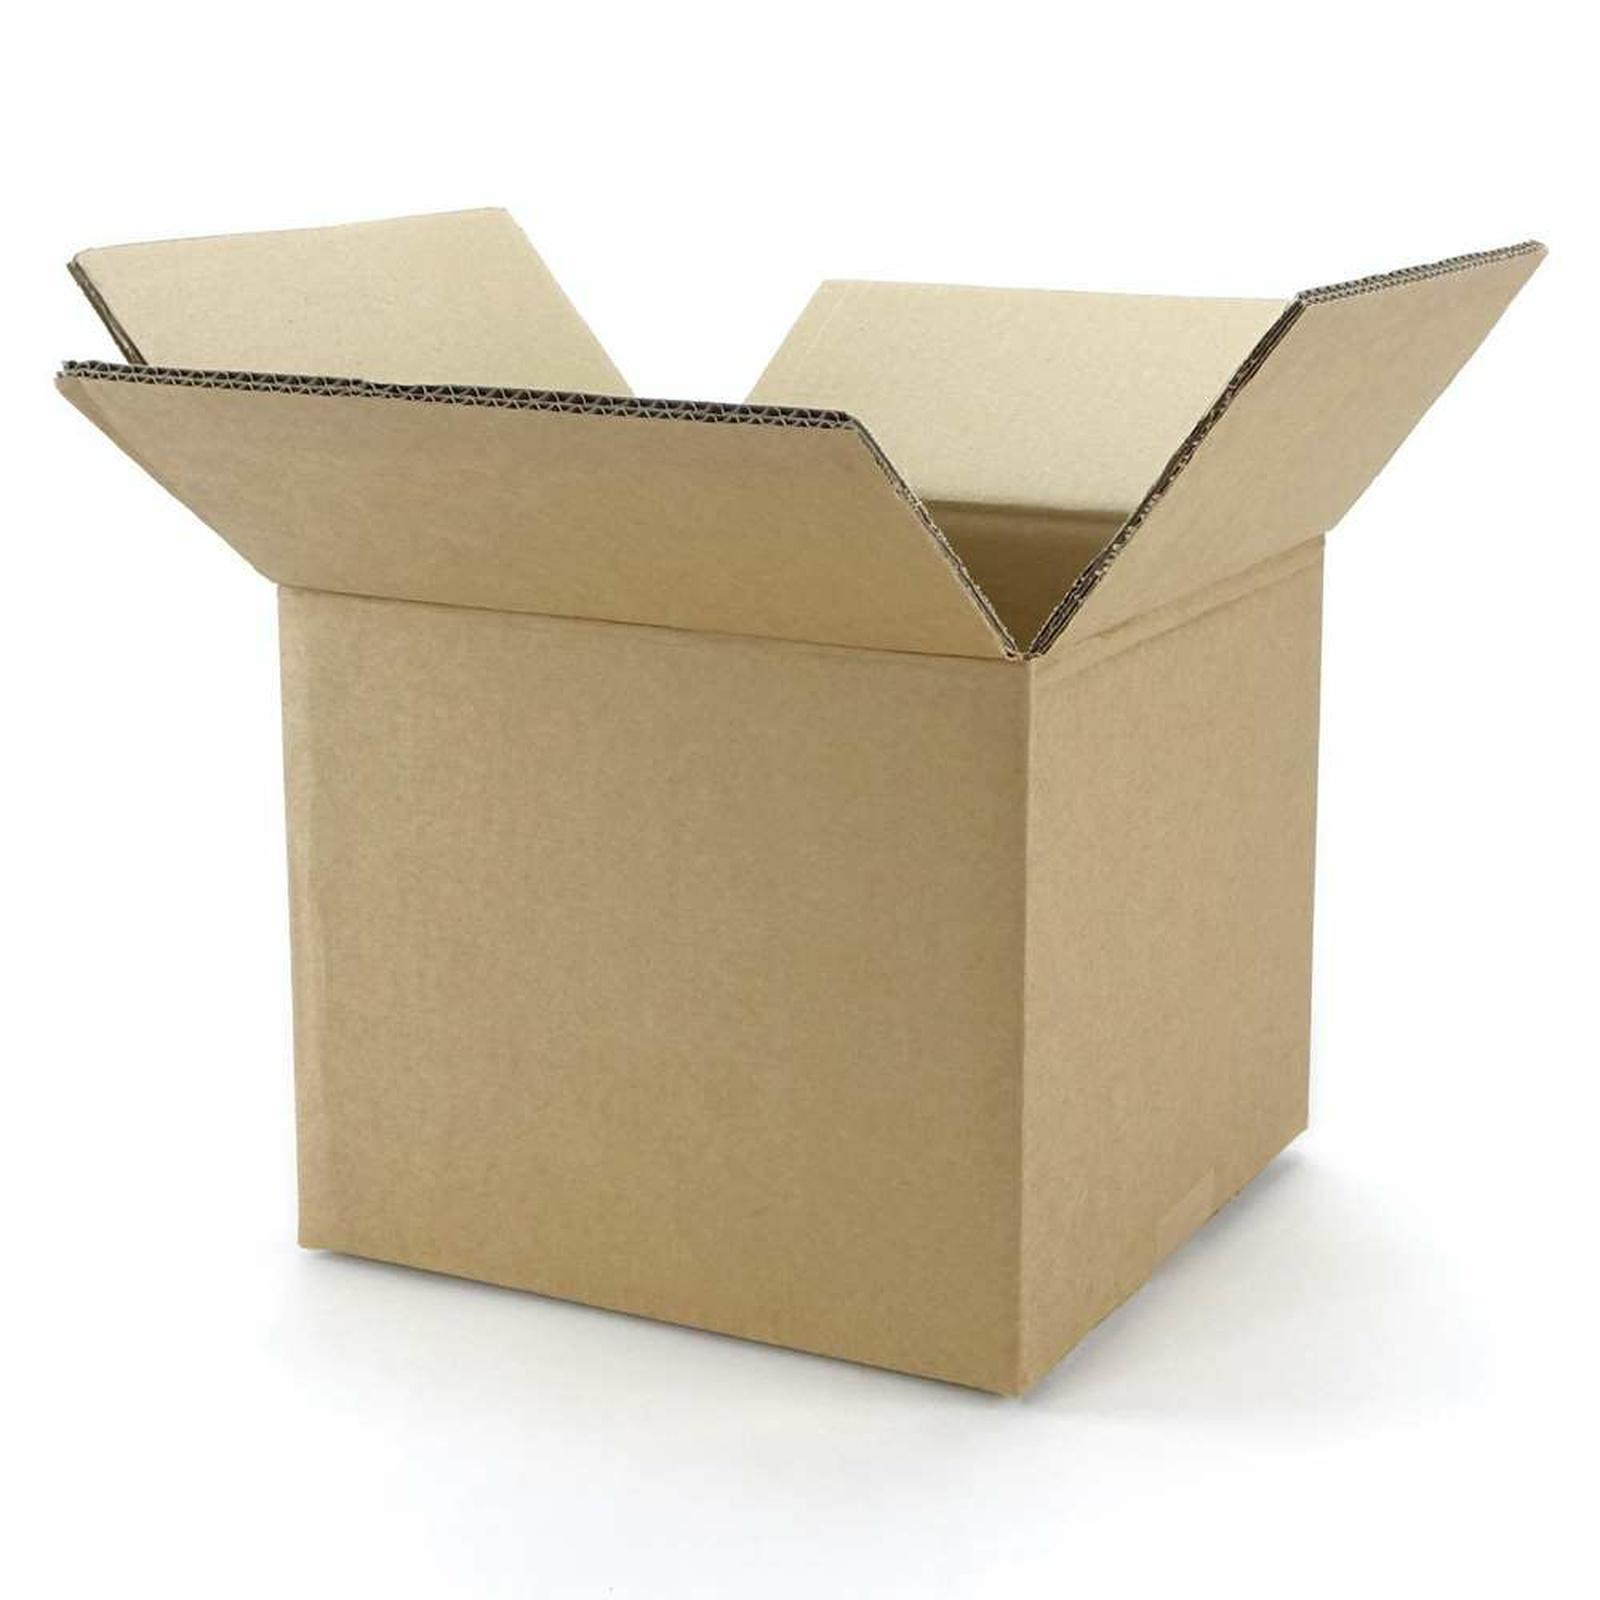 zweiwellige kartons 250x250x200 mm g nstig kaufen 0 64. Black Bedroom Furniture Sets. Home Design Ideas